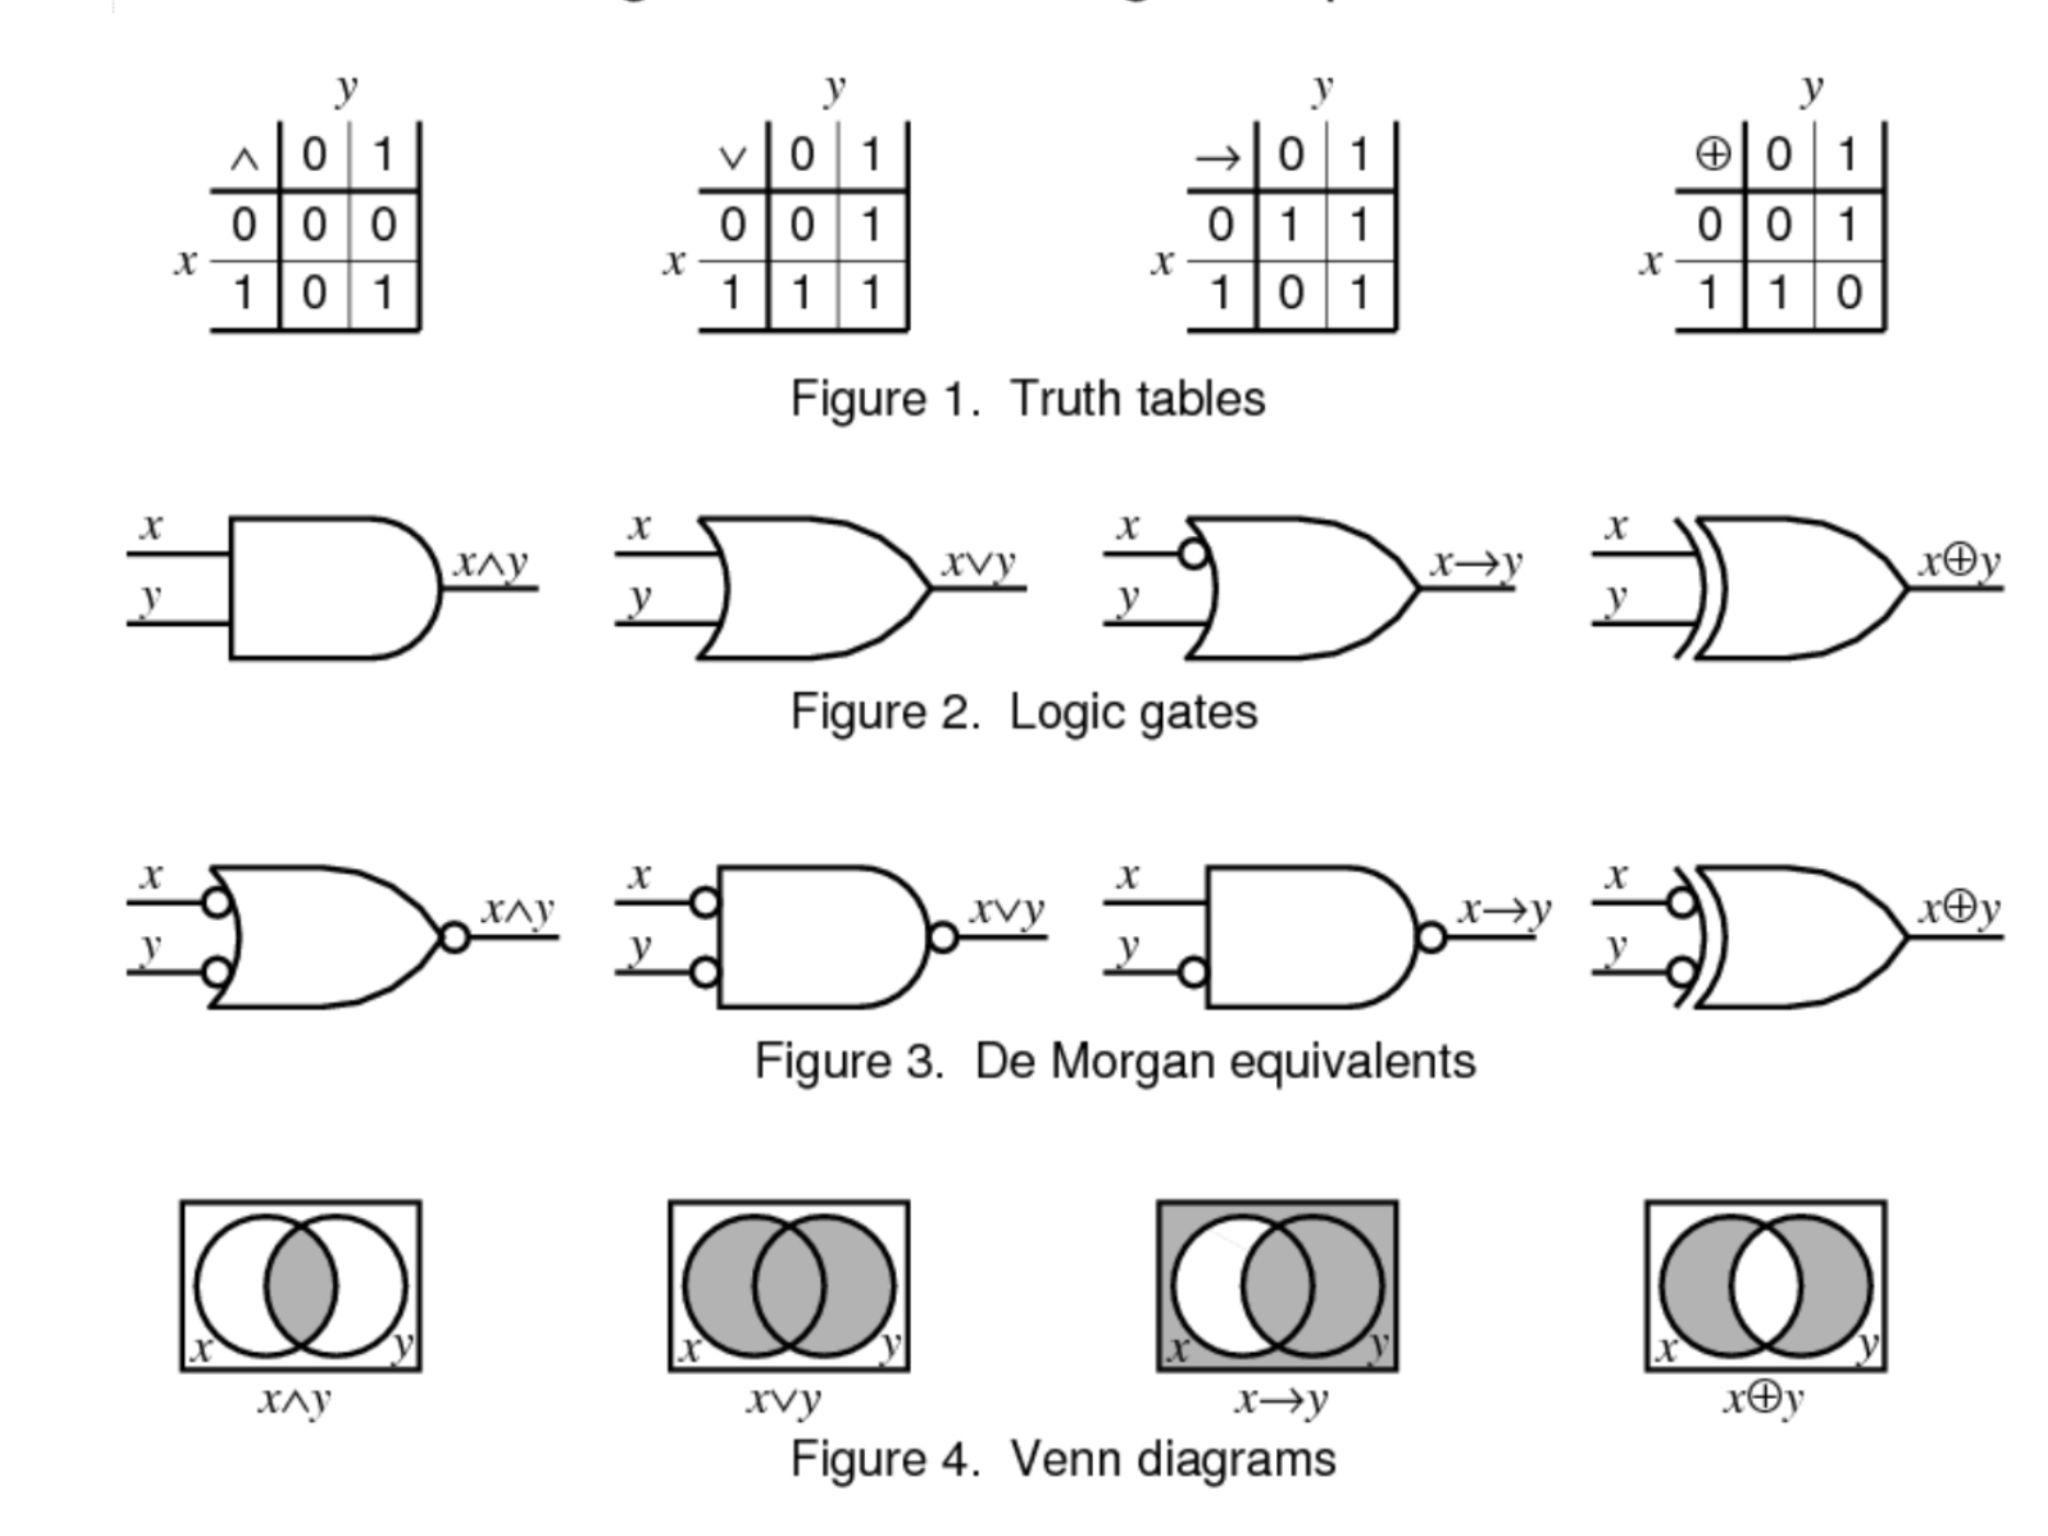 Booleon Logic: Truth Tables, Logic Gates, Venn Diagrams